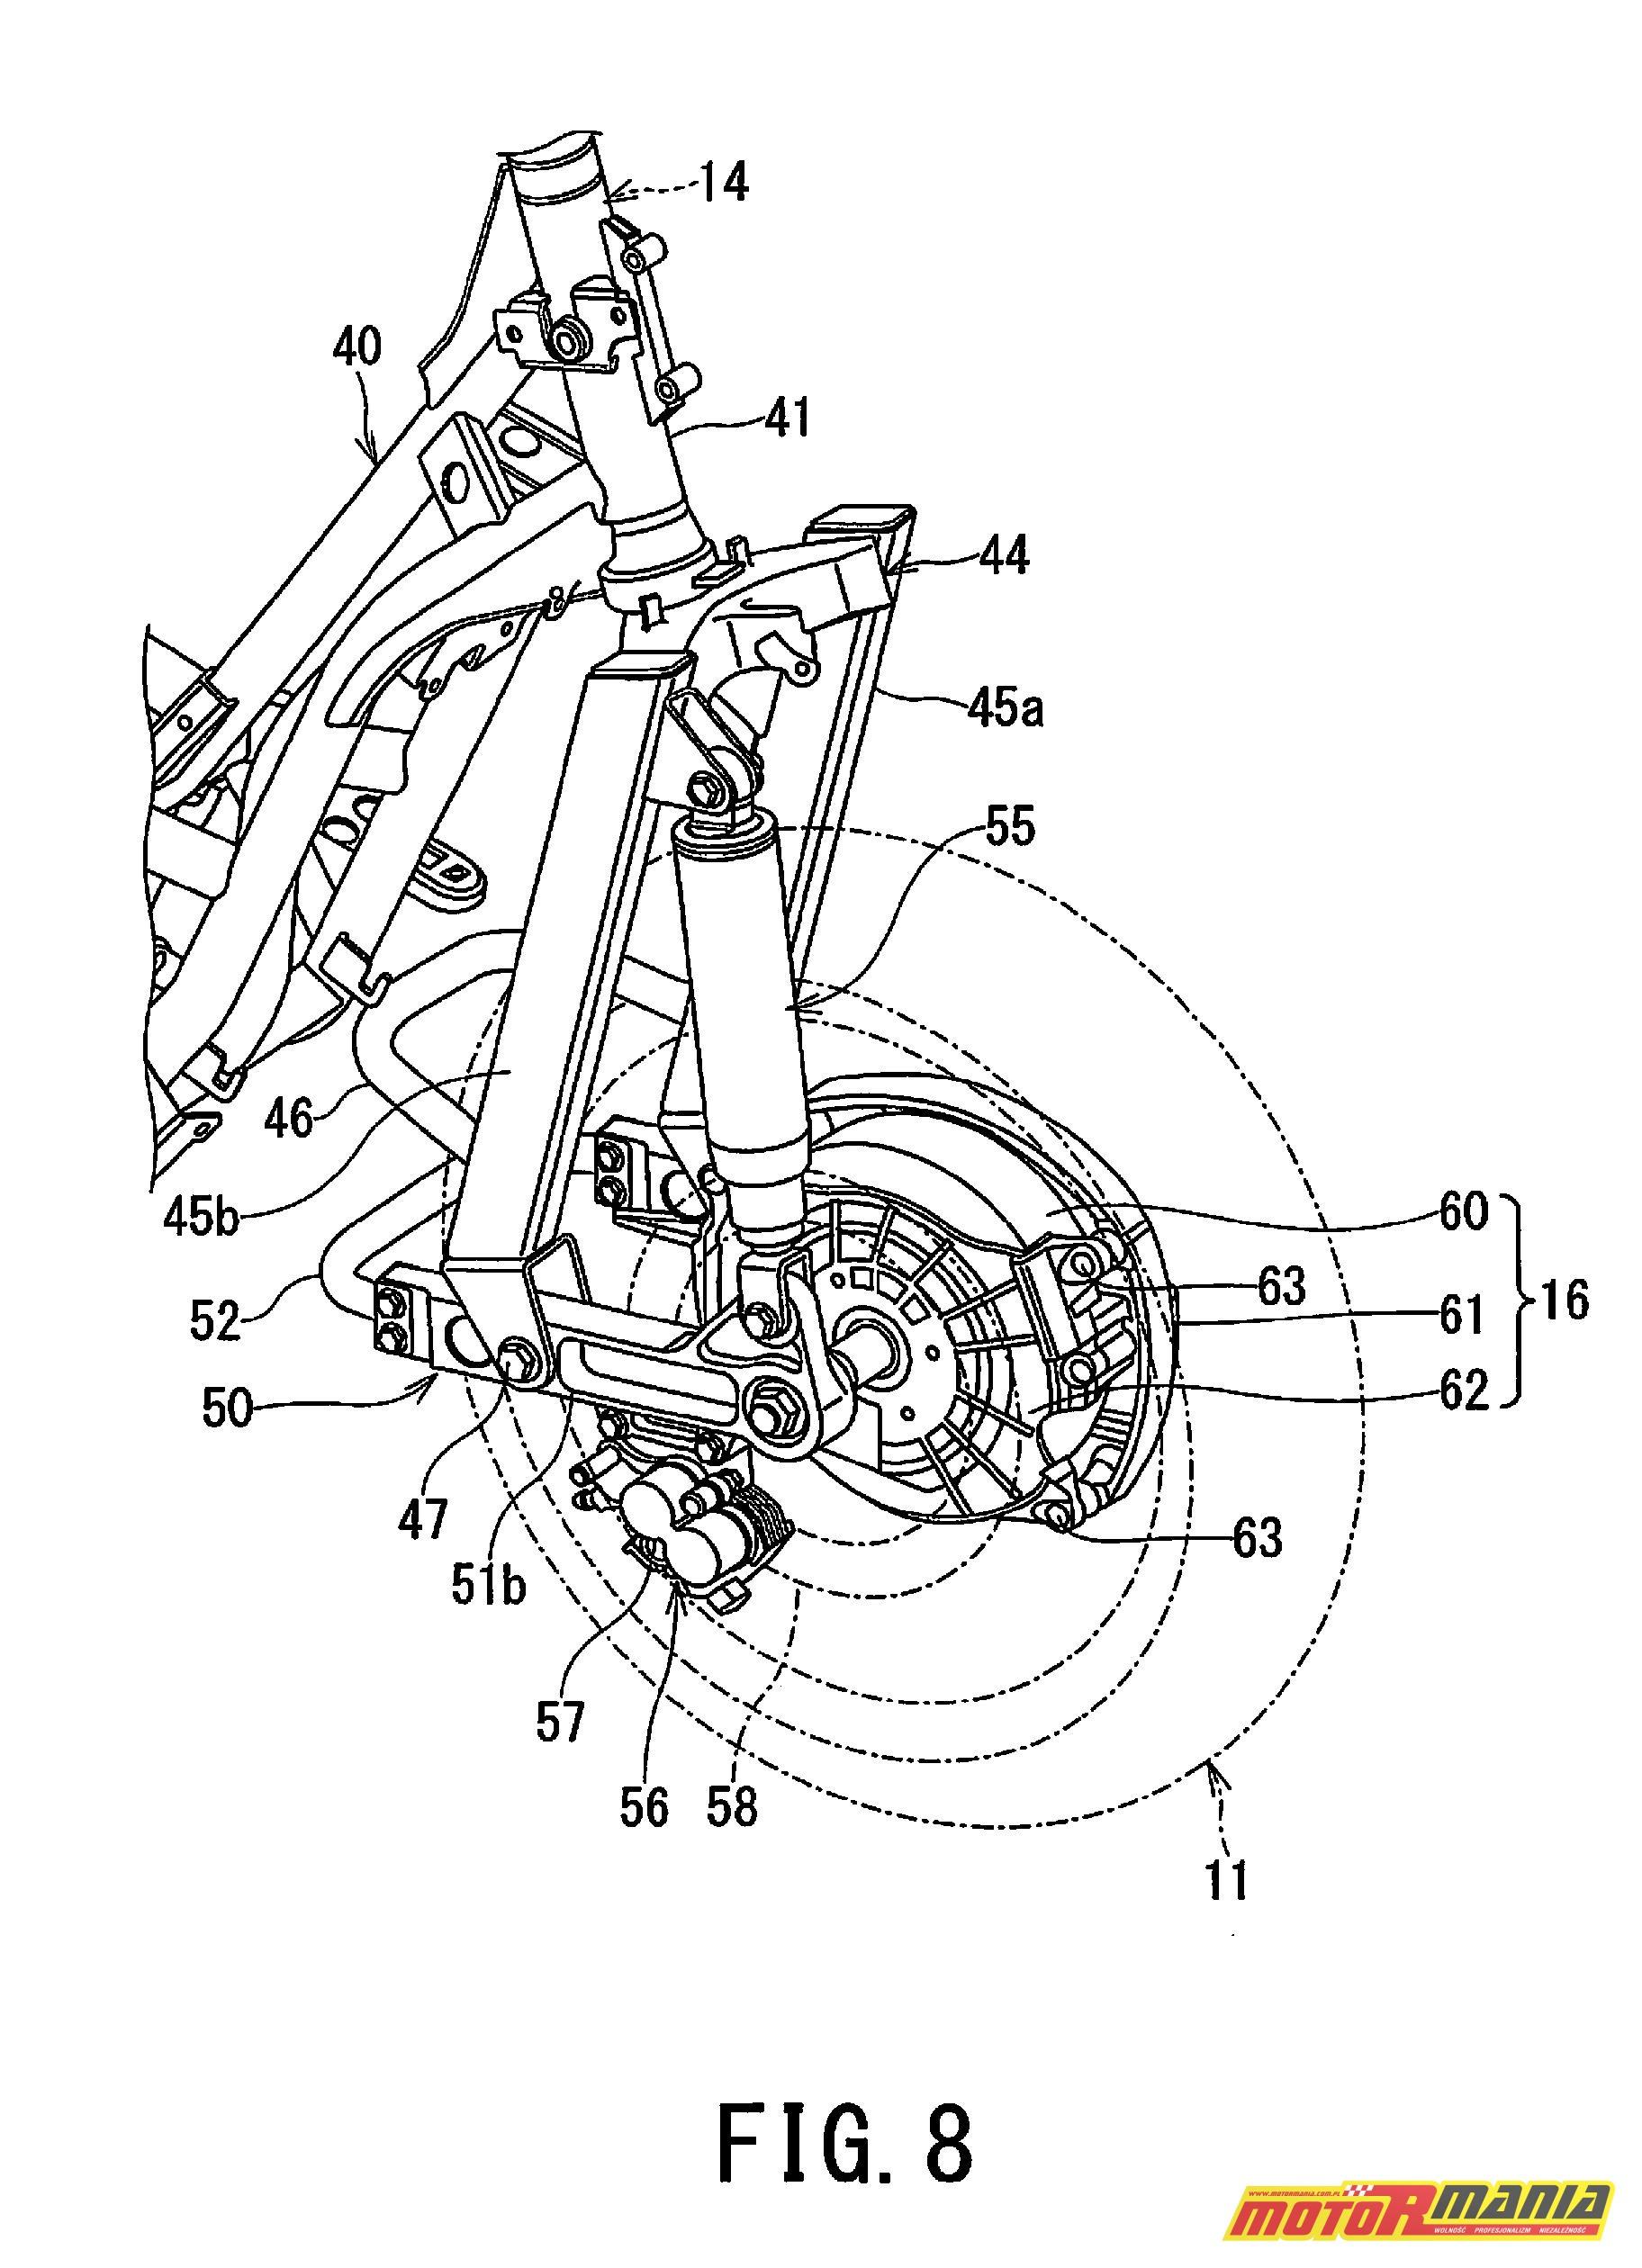 Suzuki Burgman 2WD hybryda elektryk - diagram (8)